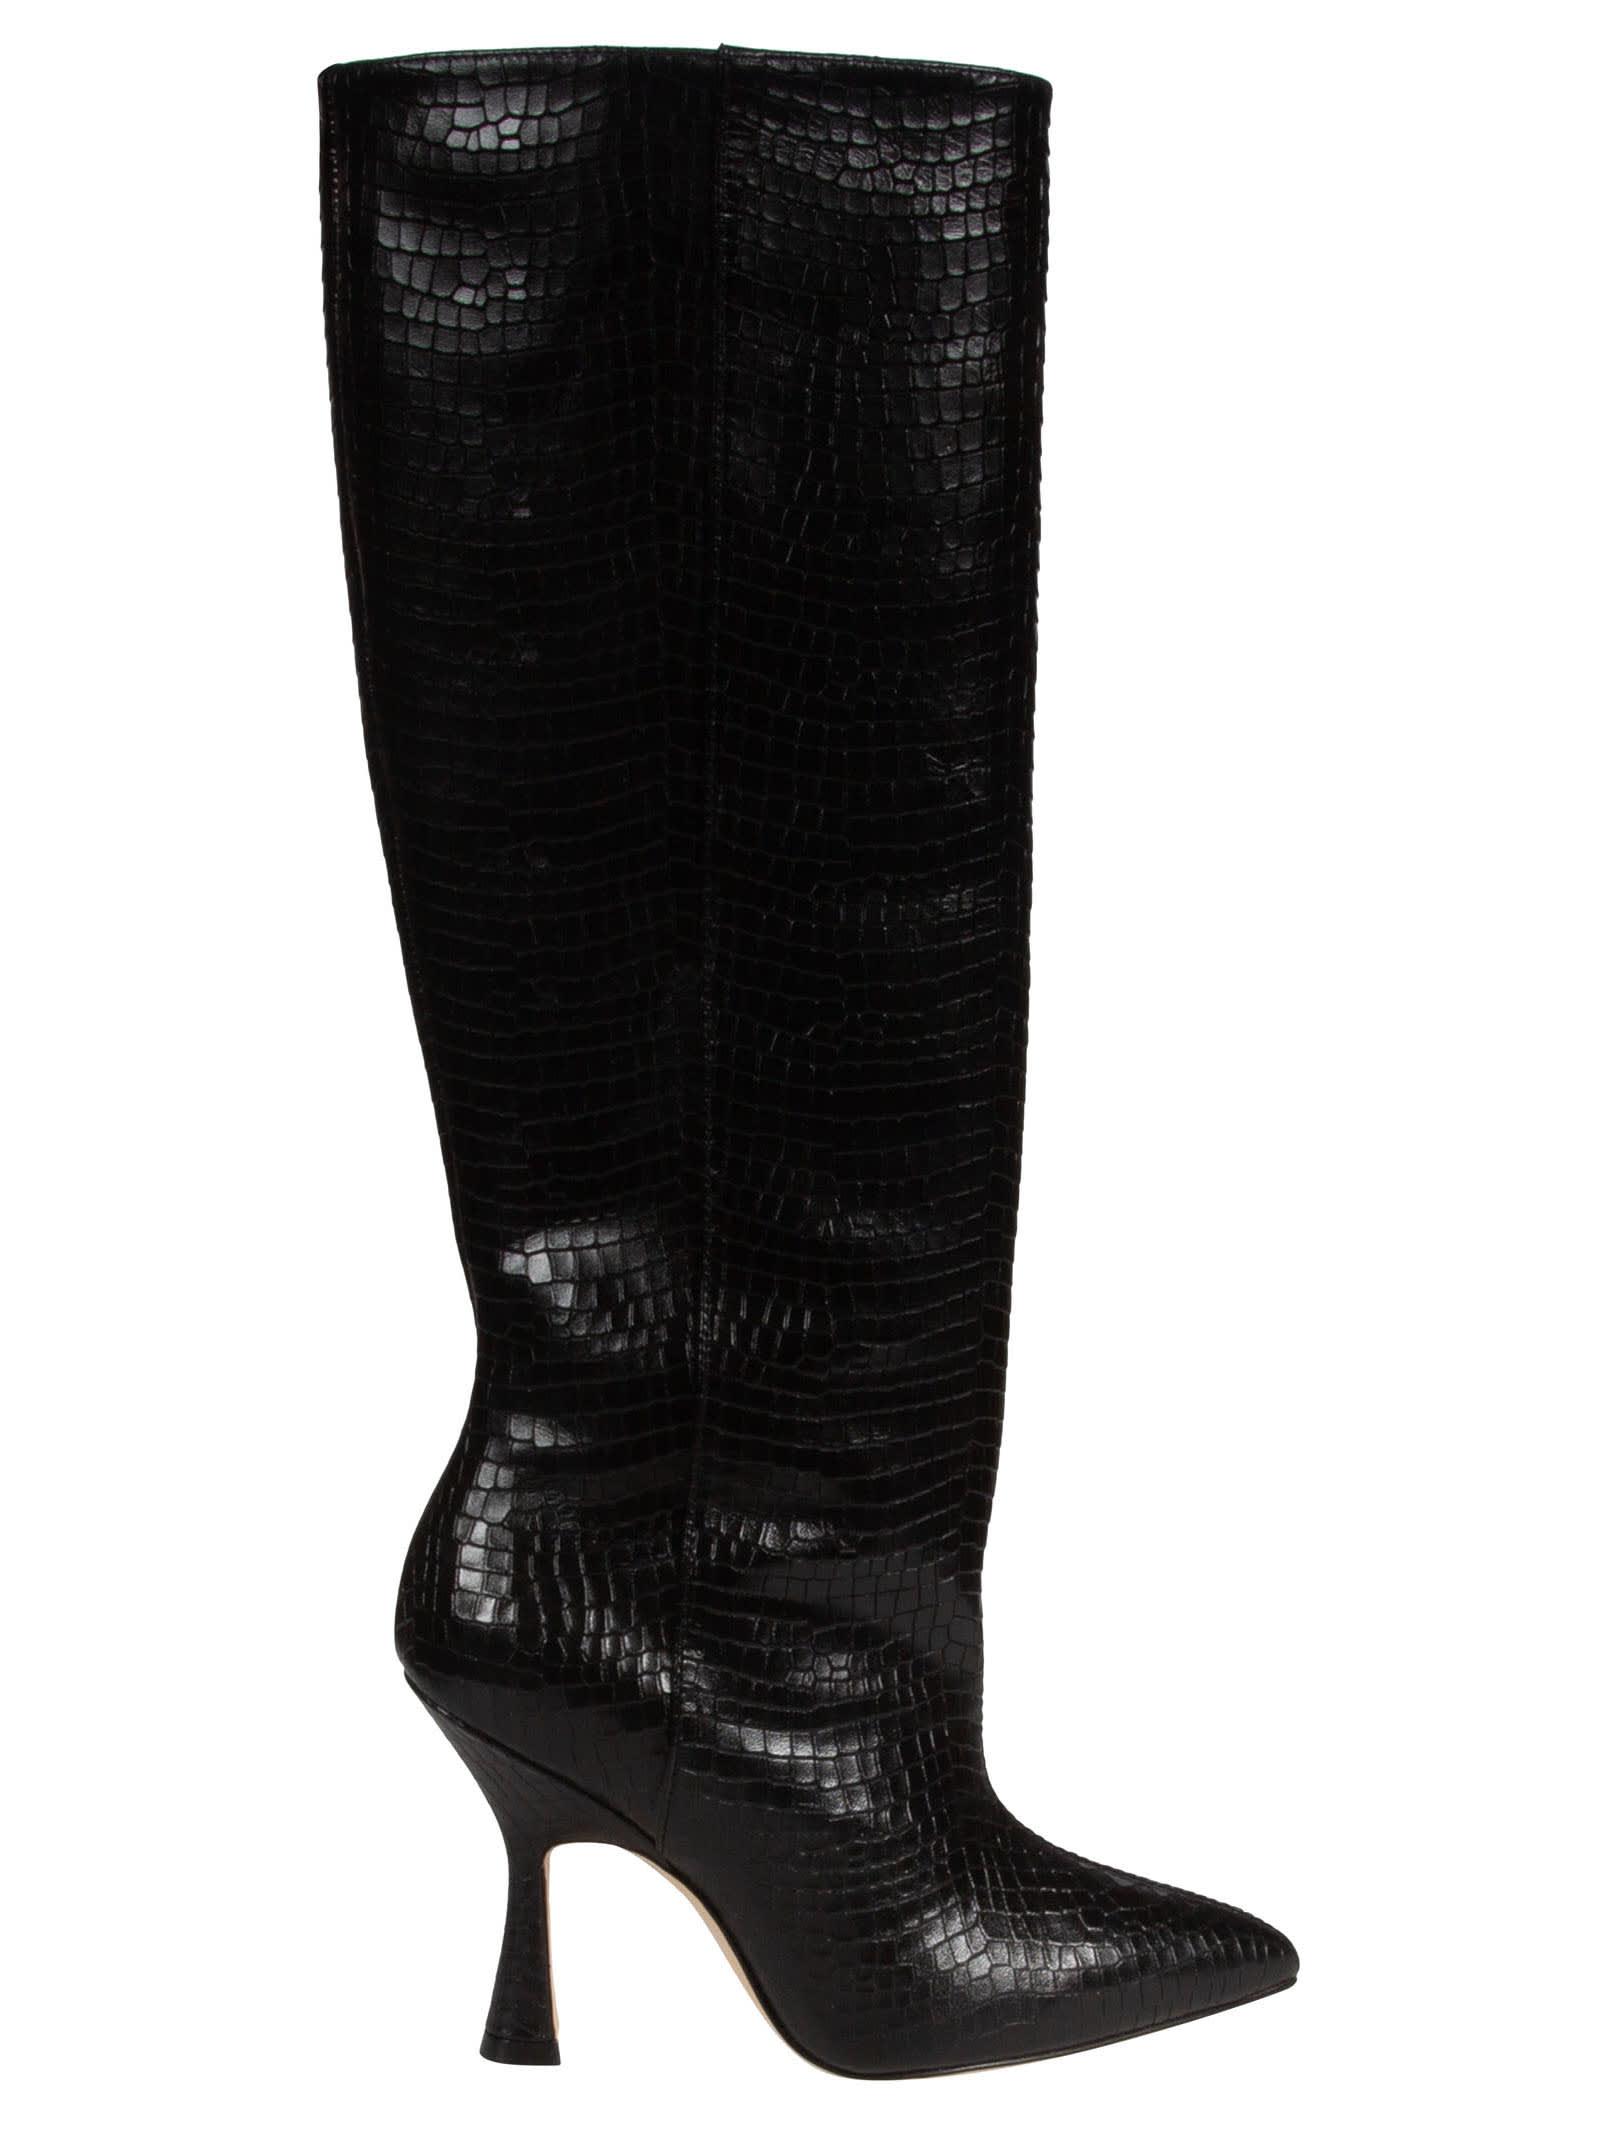 Stuart Weitzman Boots PARTON BOOTS